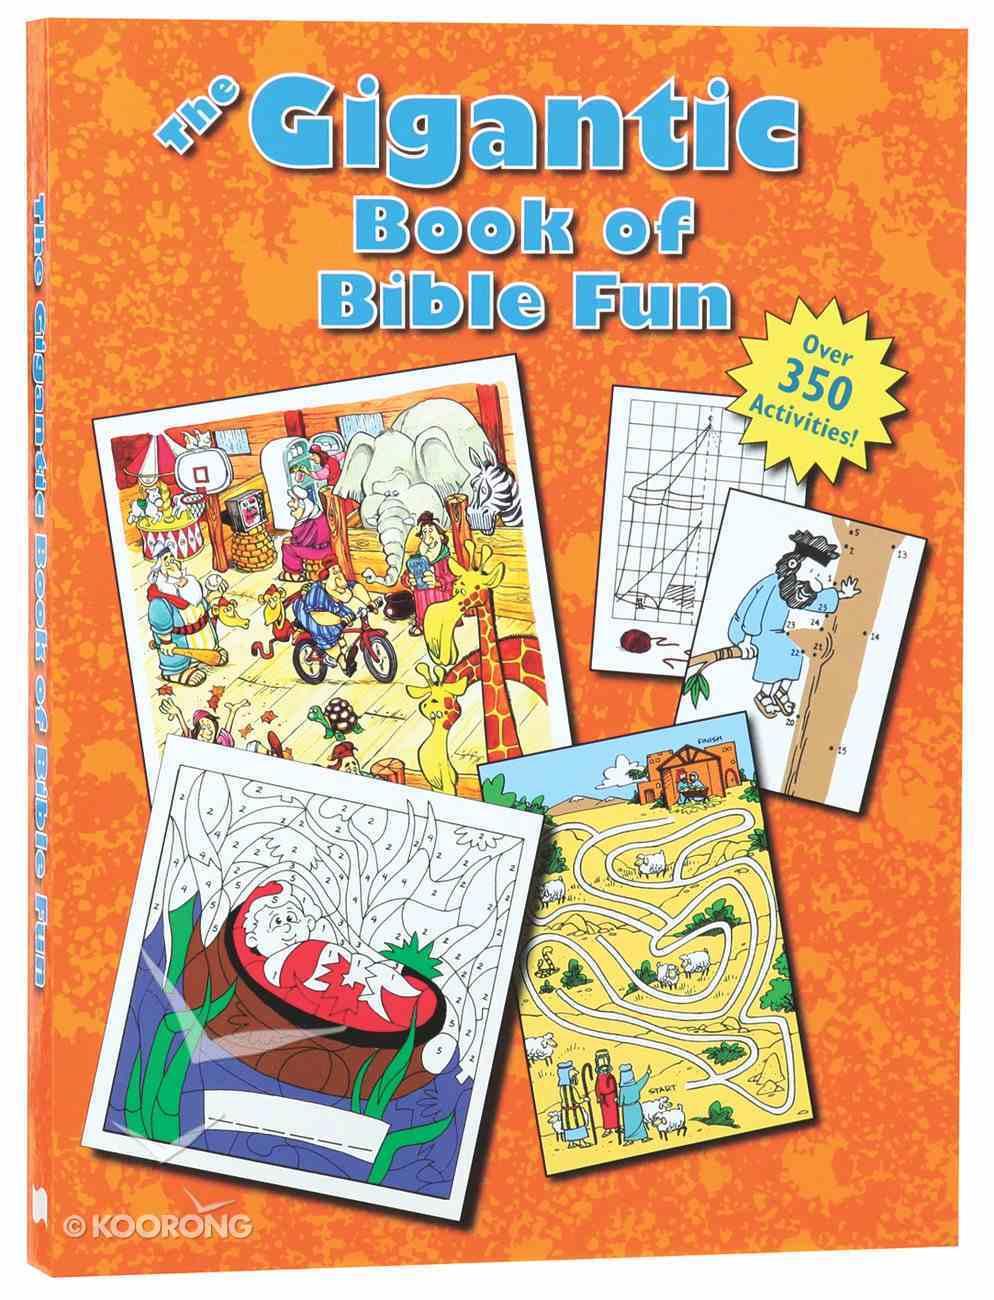 The Gigantic Book of Bible Fun (Reproducible) Paperback